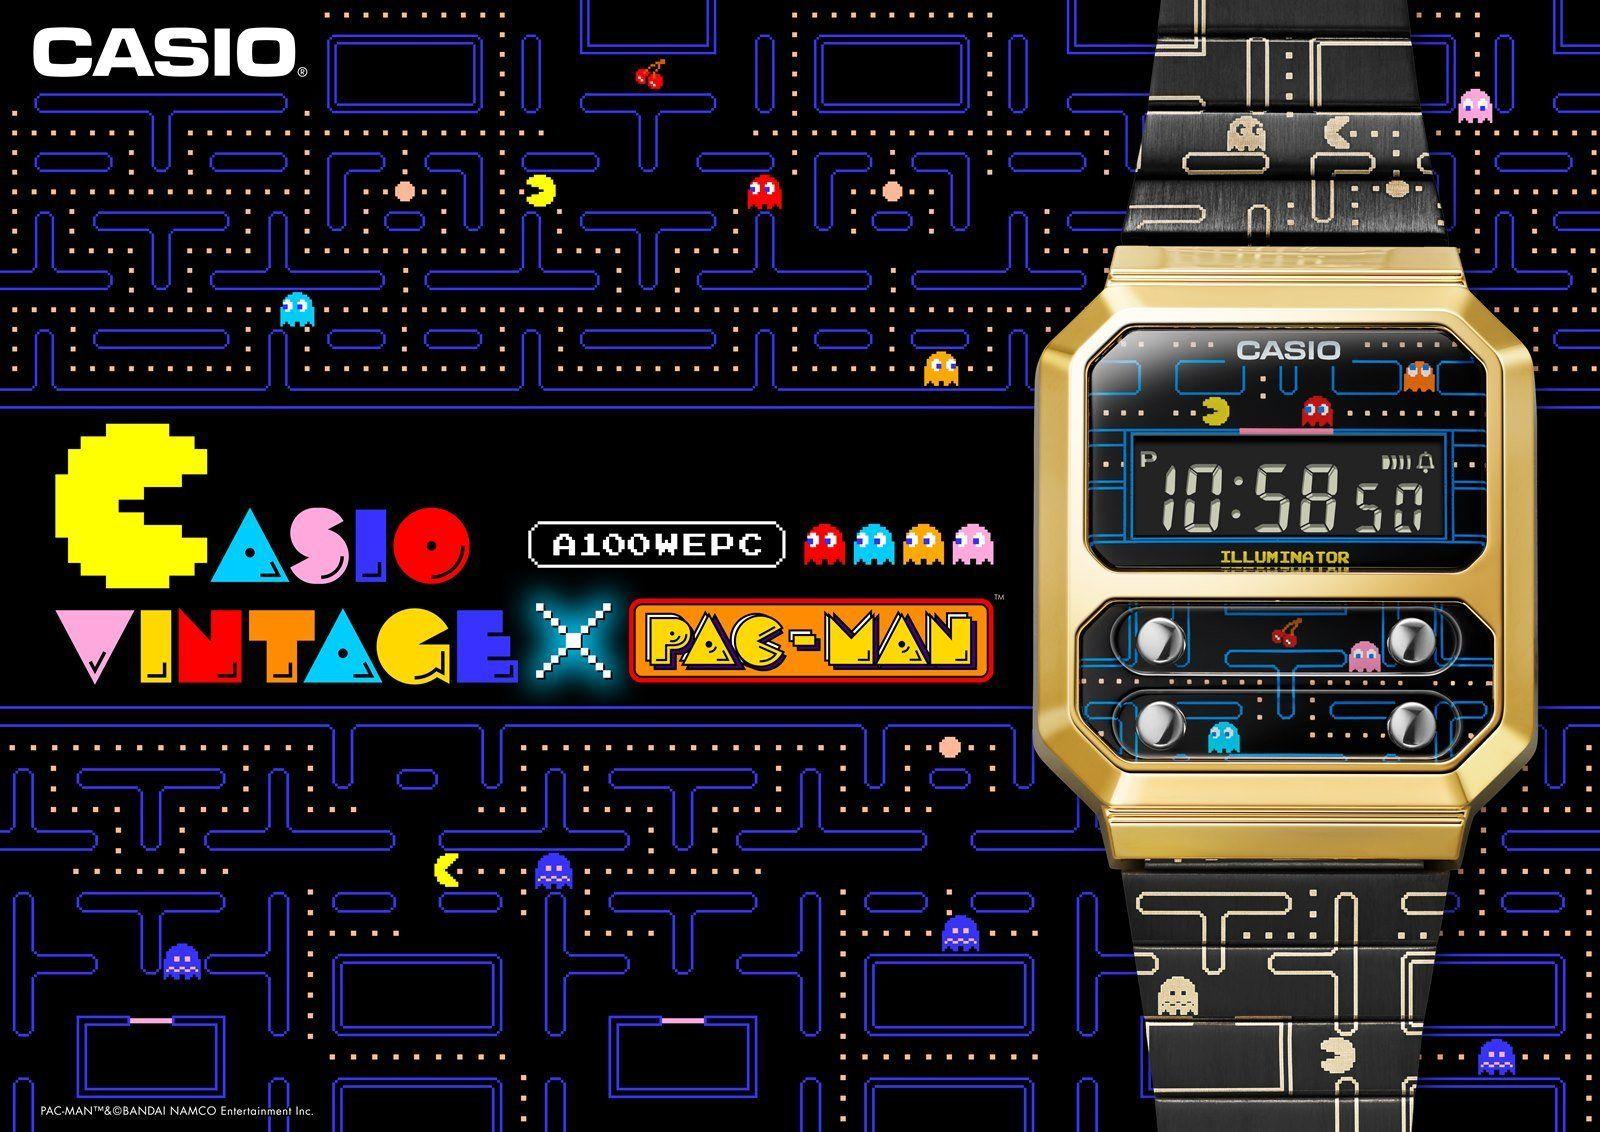 Casio-Pacman-1.jpg